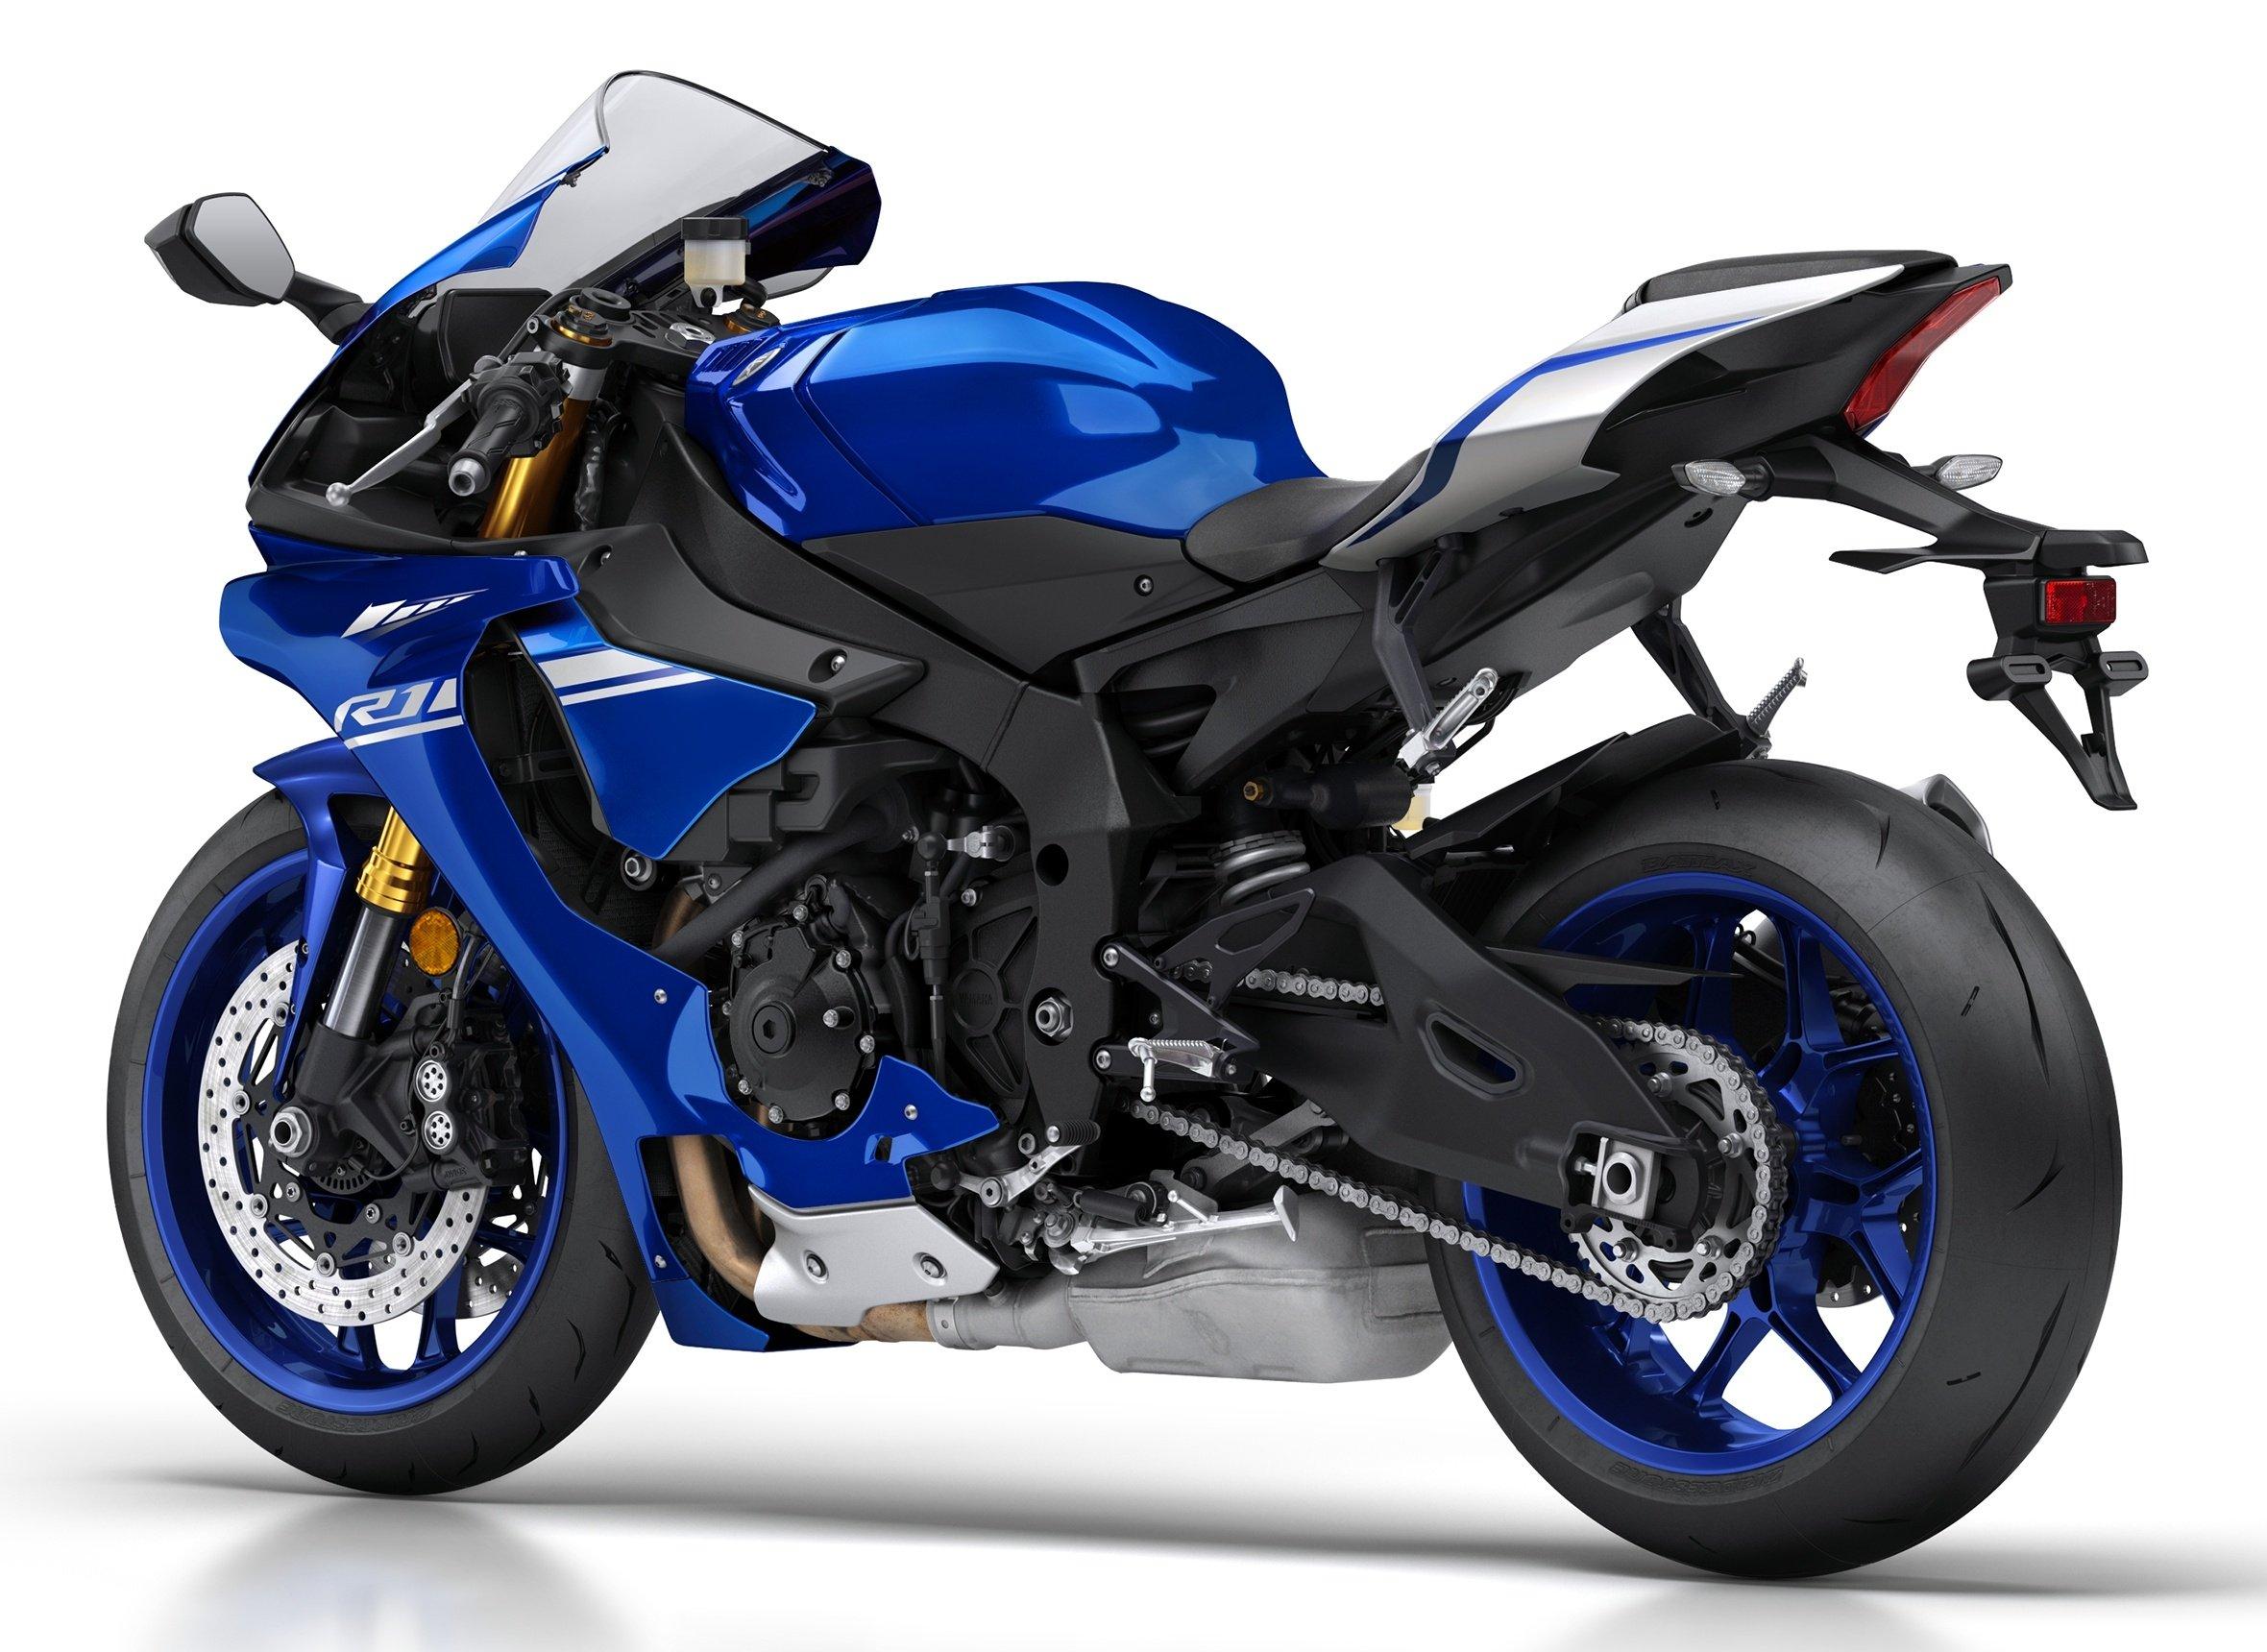 2017 yamaha motorcycles get new colour schemes image 556047. Black Bedroom Furniture Sets. Home Design Ideas